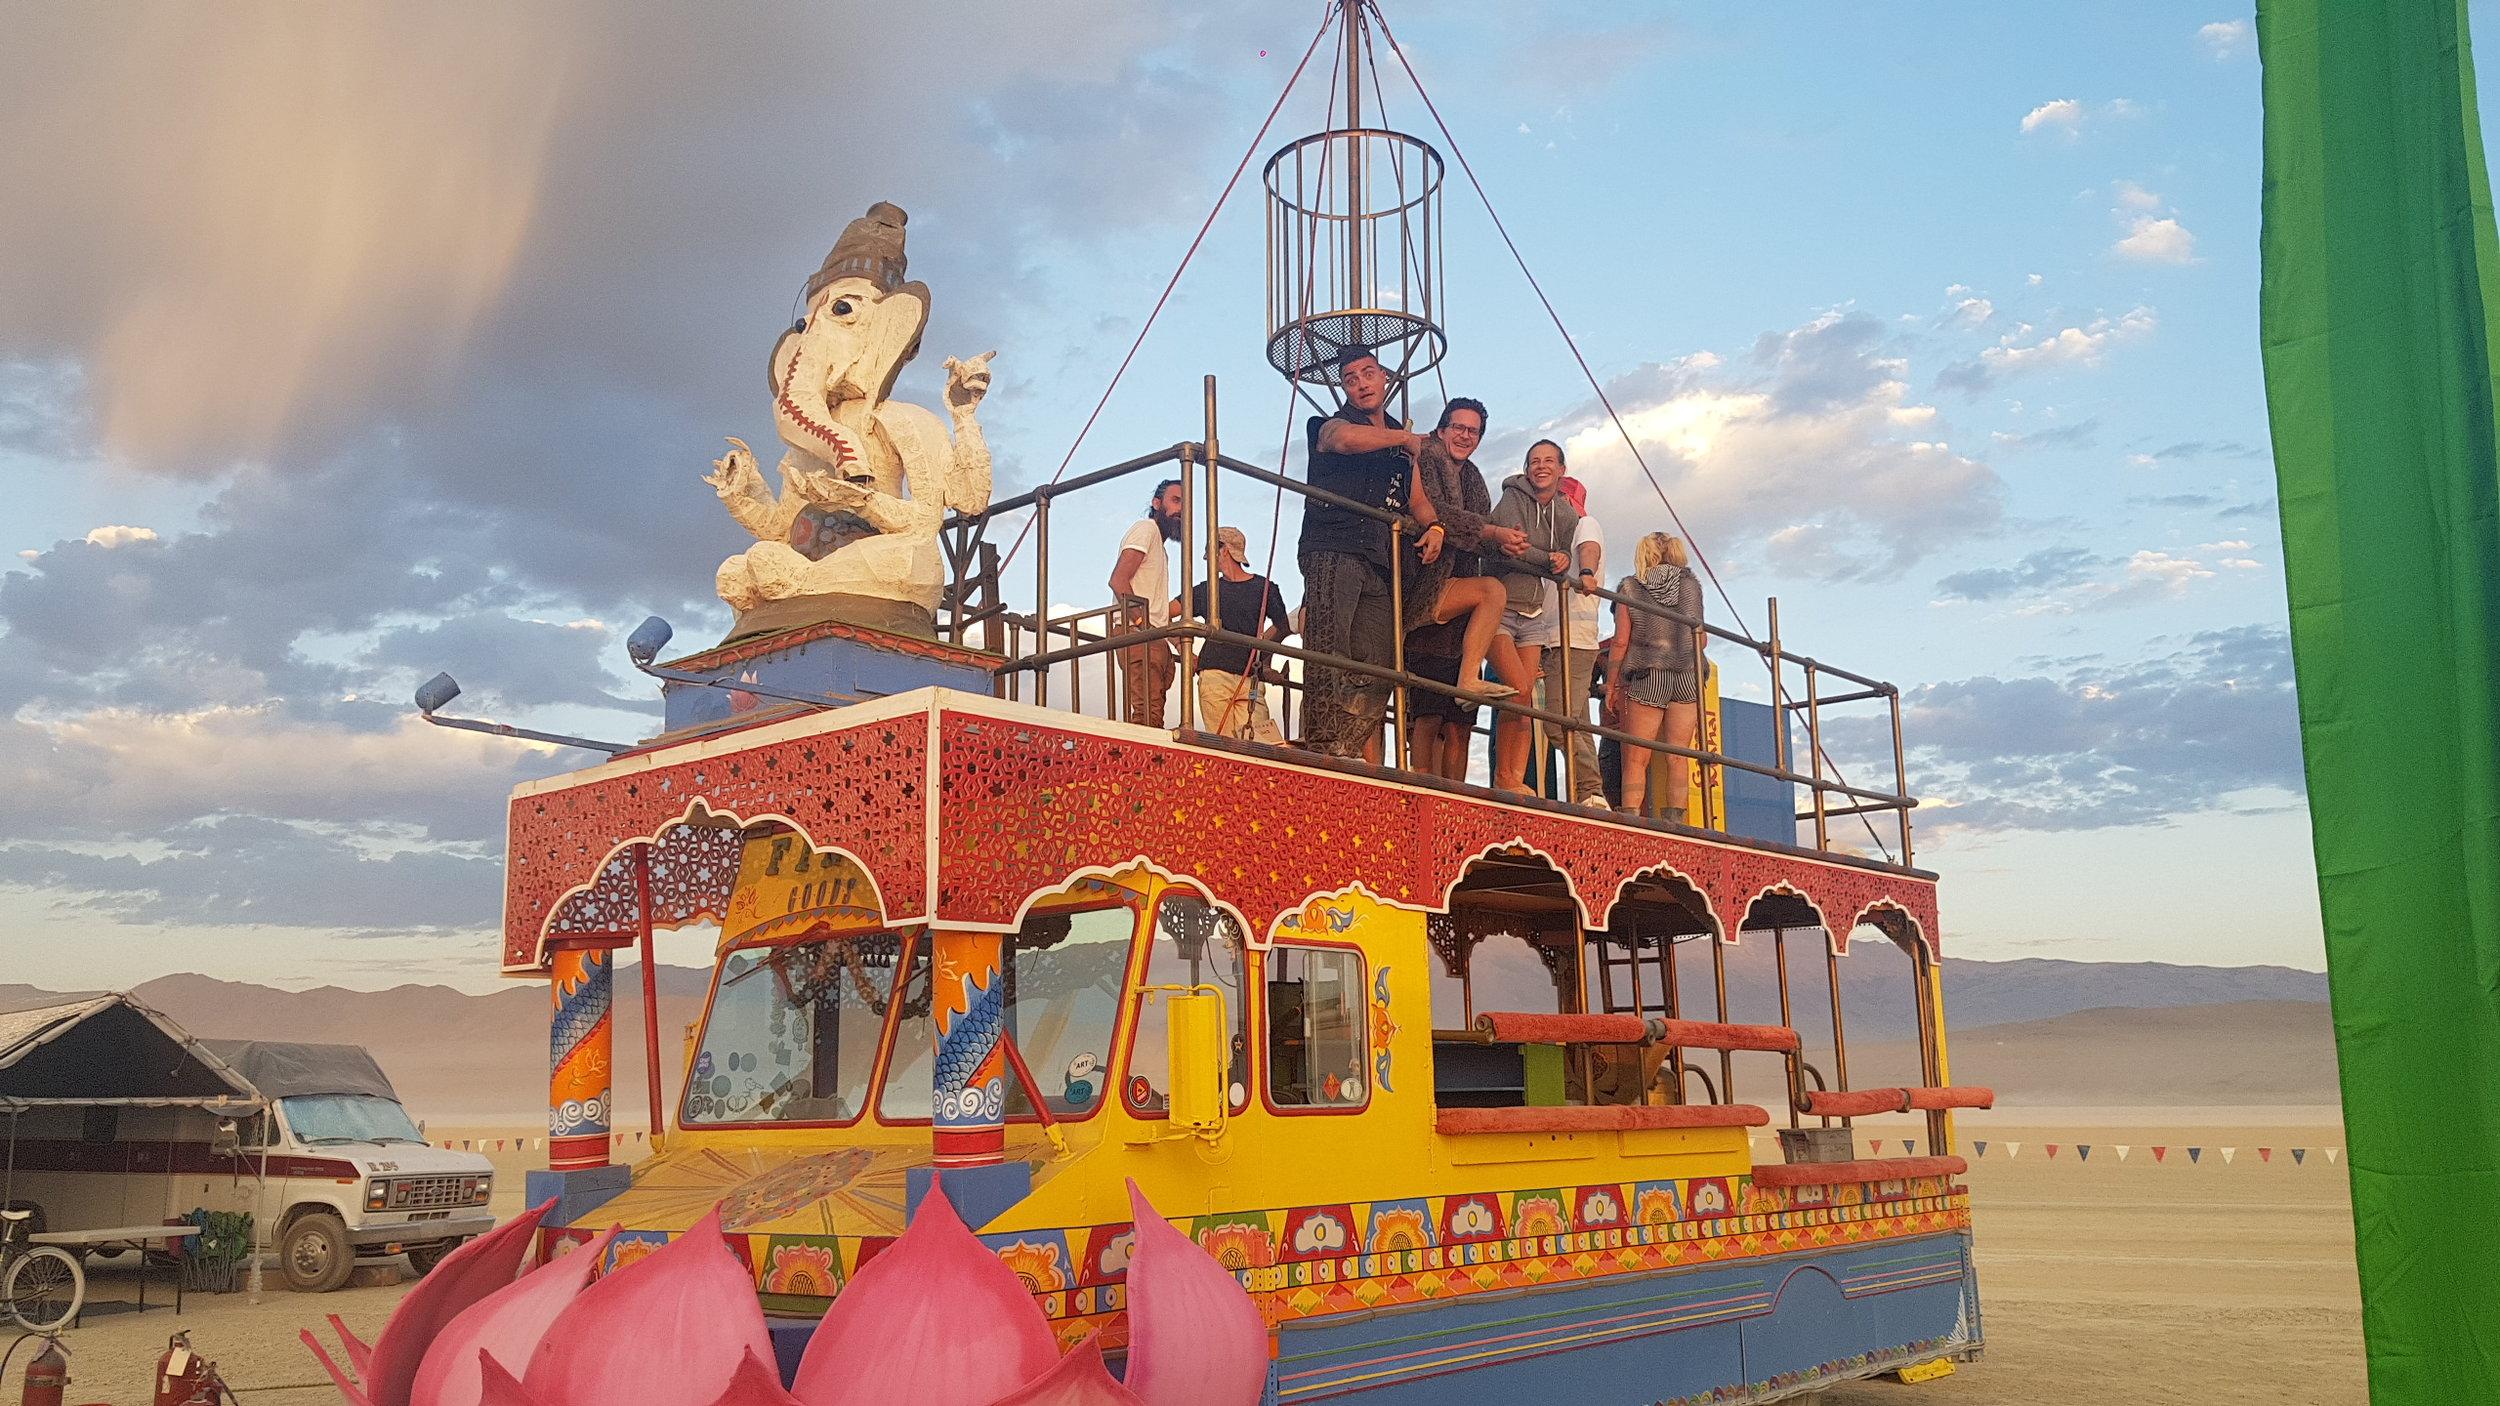 ArtCar at Burning Man